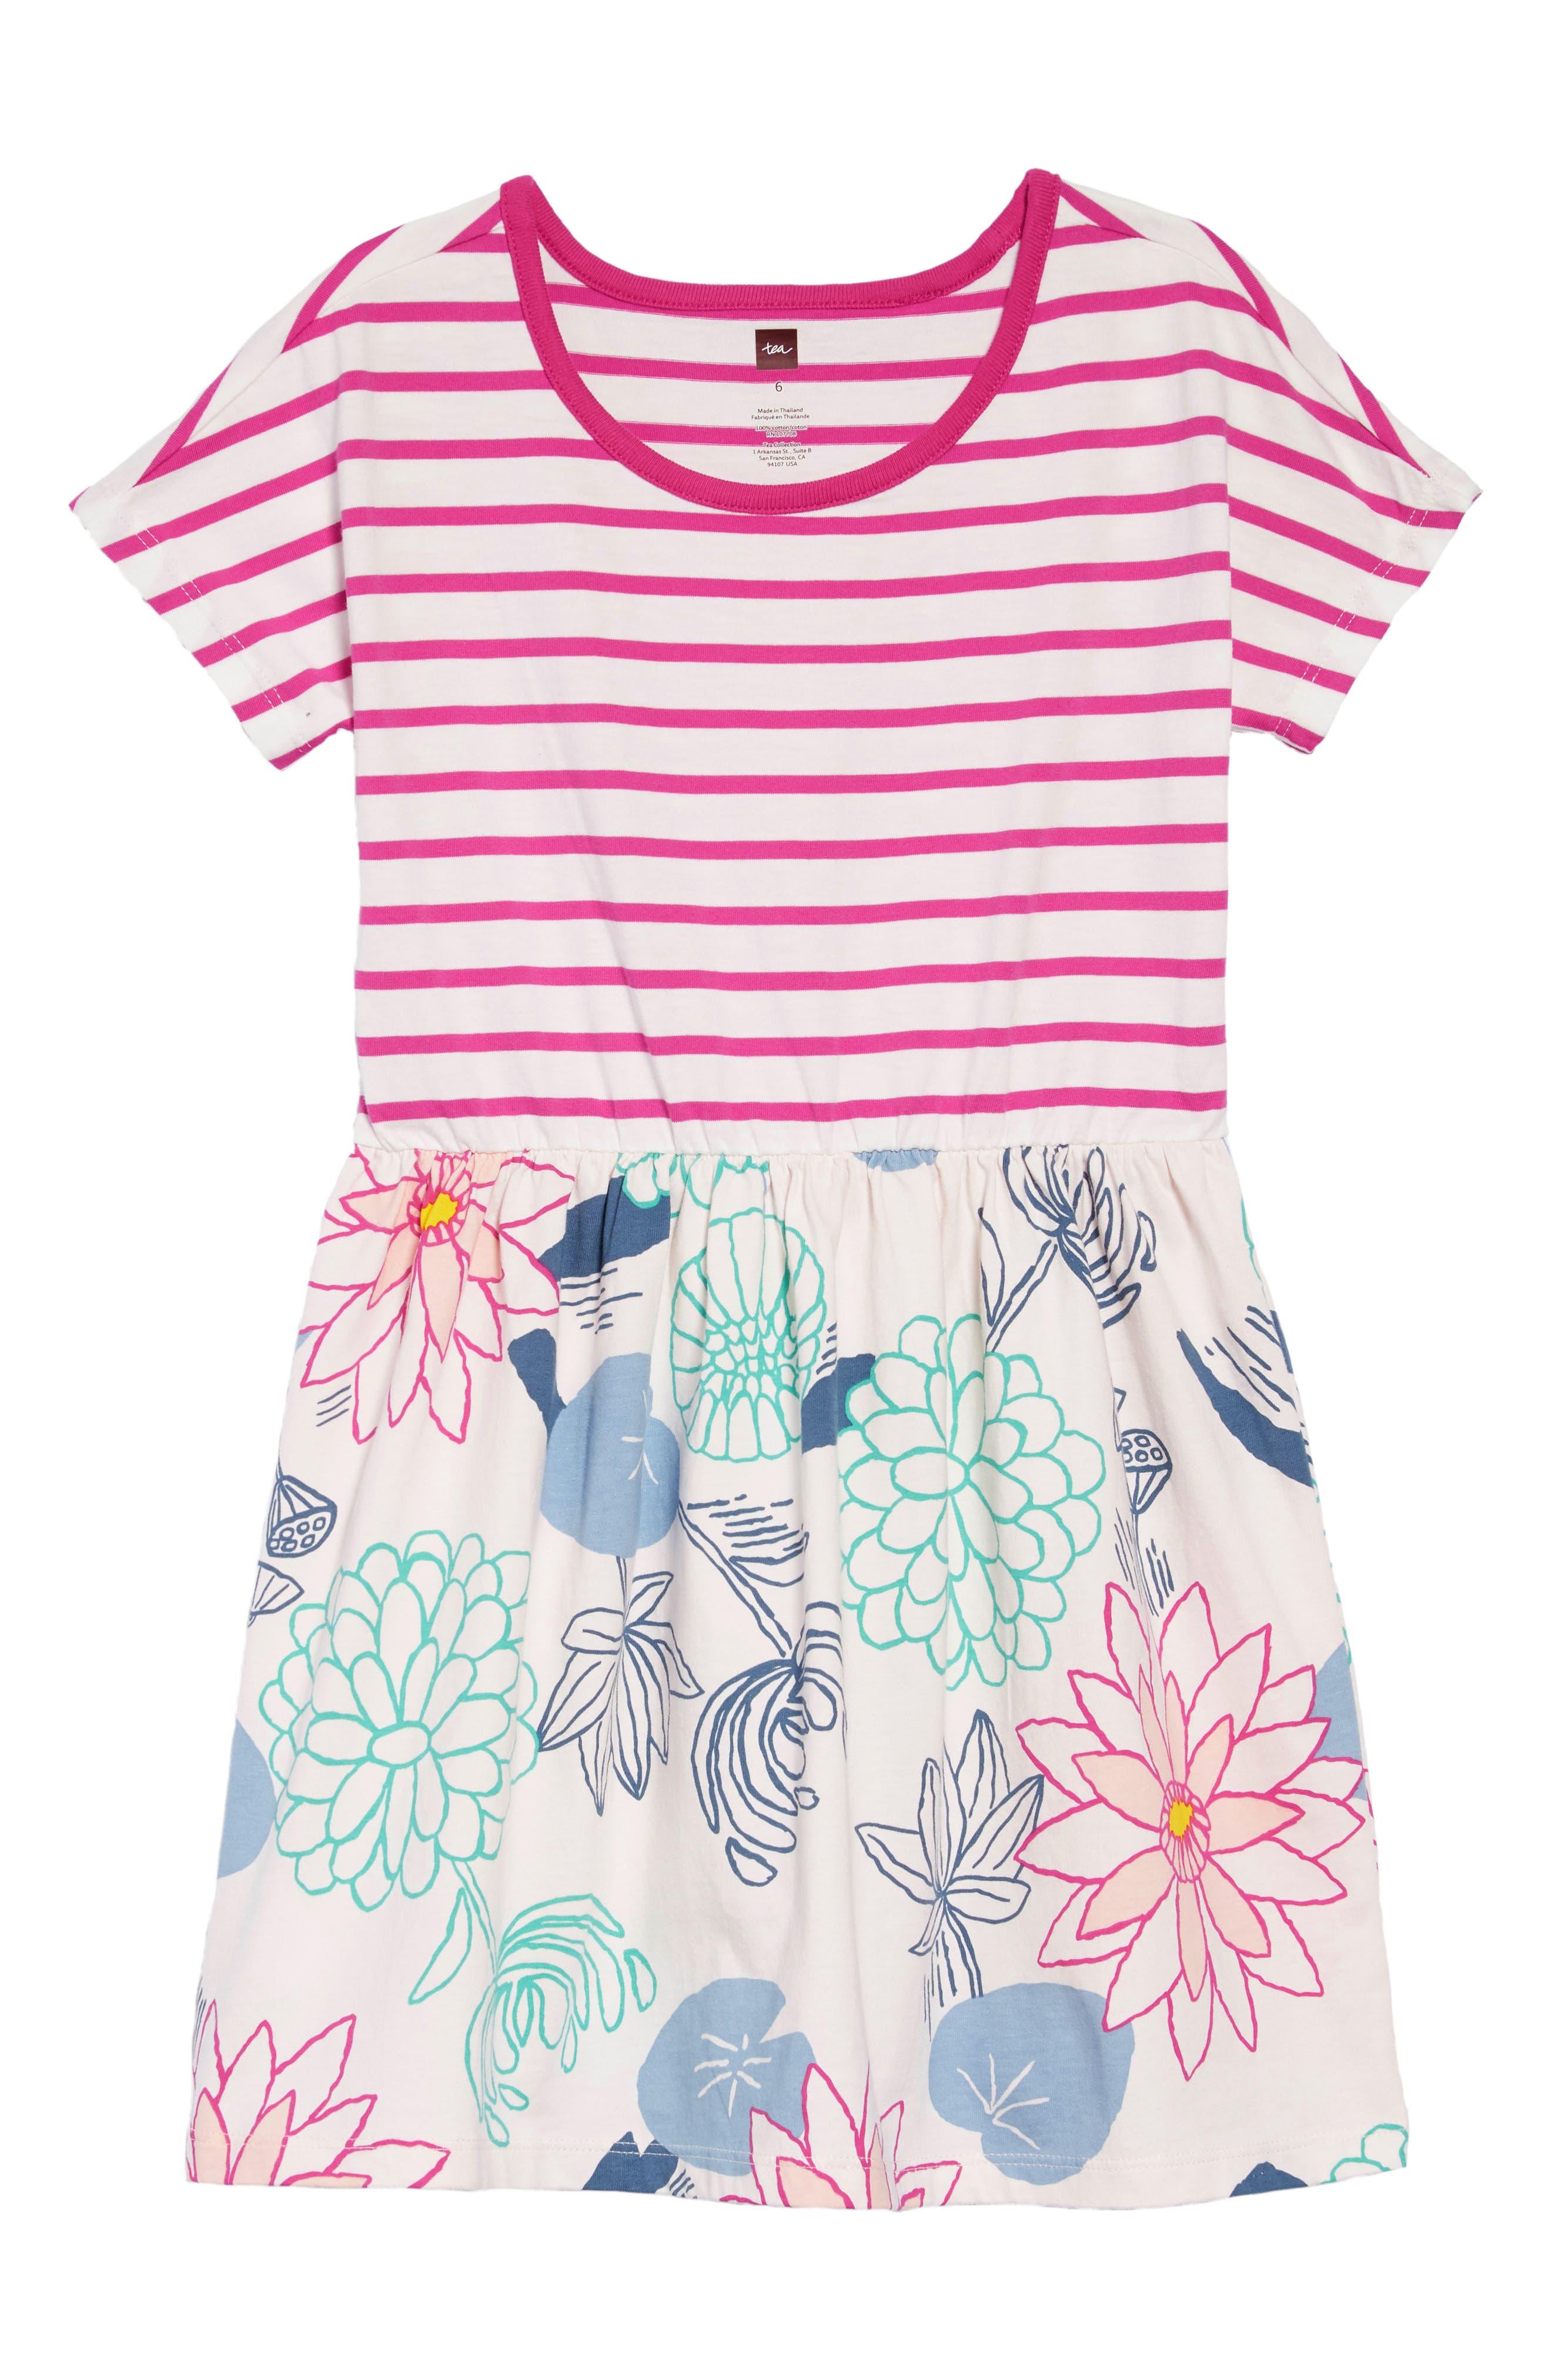 Mixed Print Dress, Main, color, LILYPAD FLORAL - SILKWORM